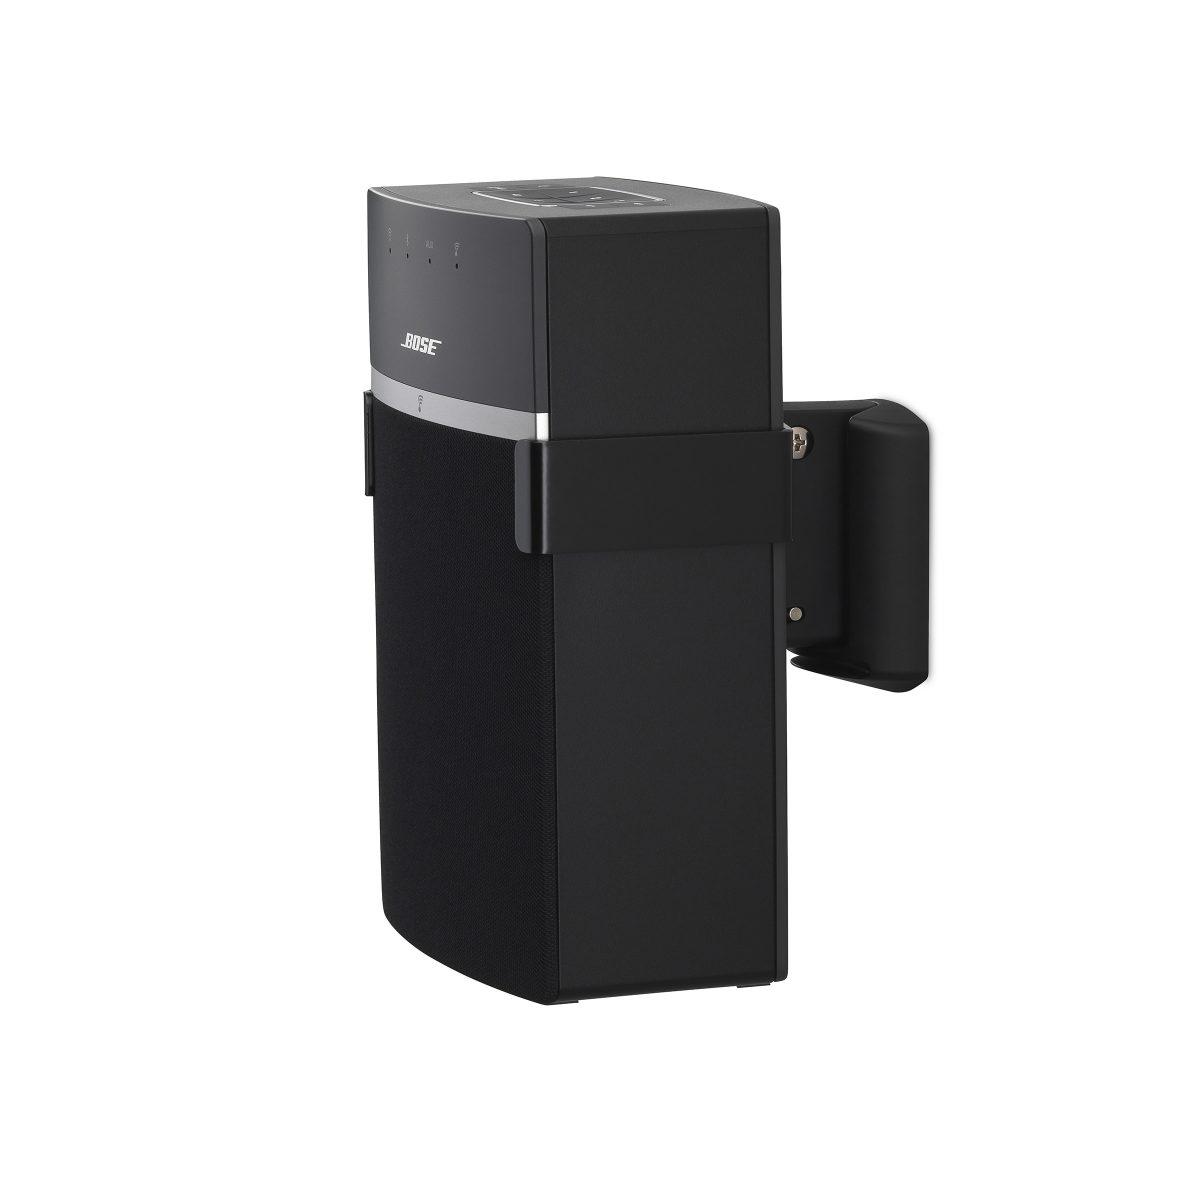 Bose SoundTouch 10 Muurbeugel zwart 6